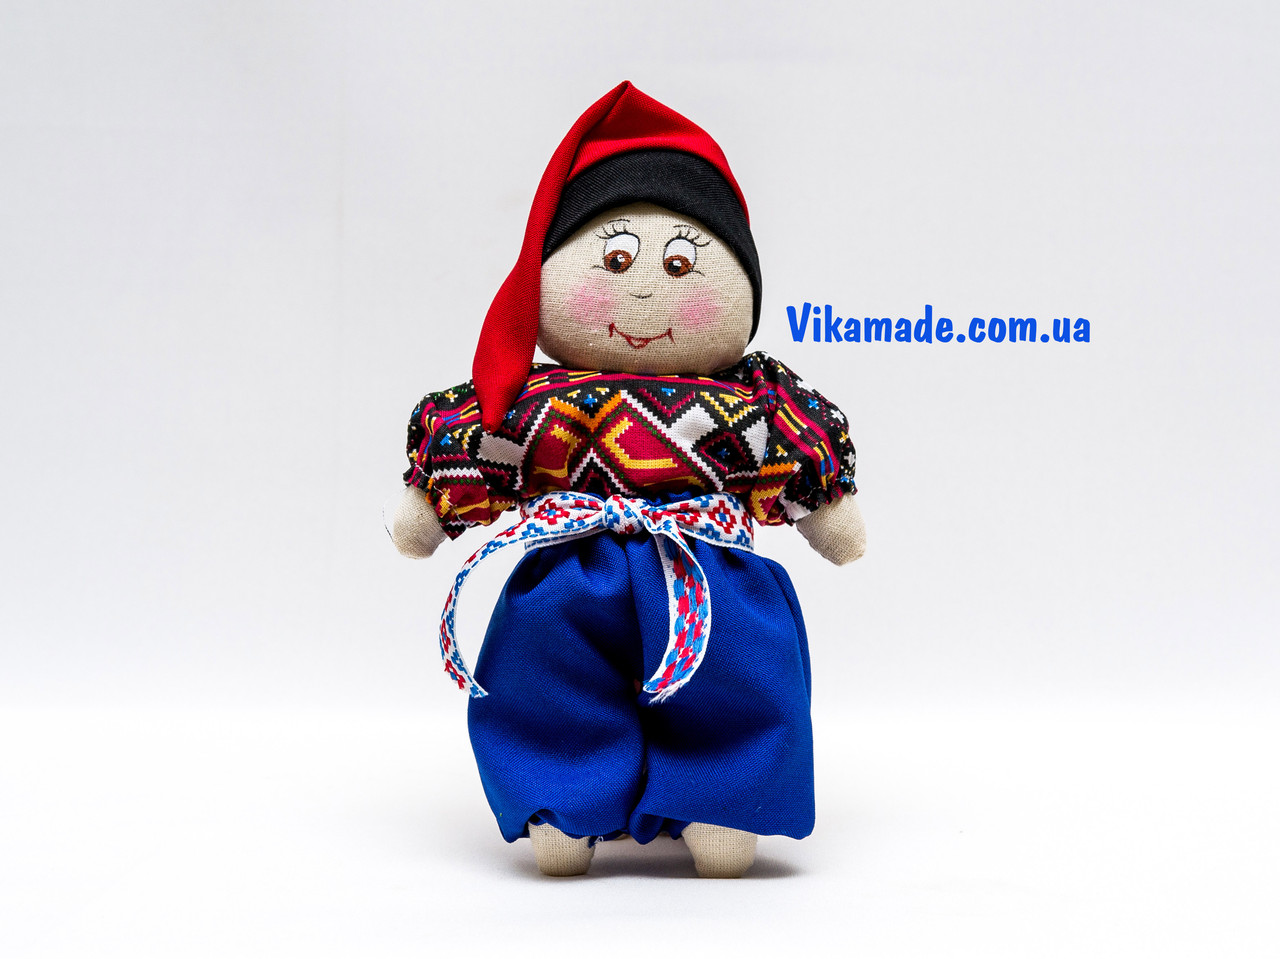 Кукла Украинка, малая мальчик